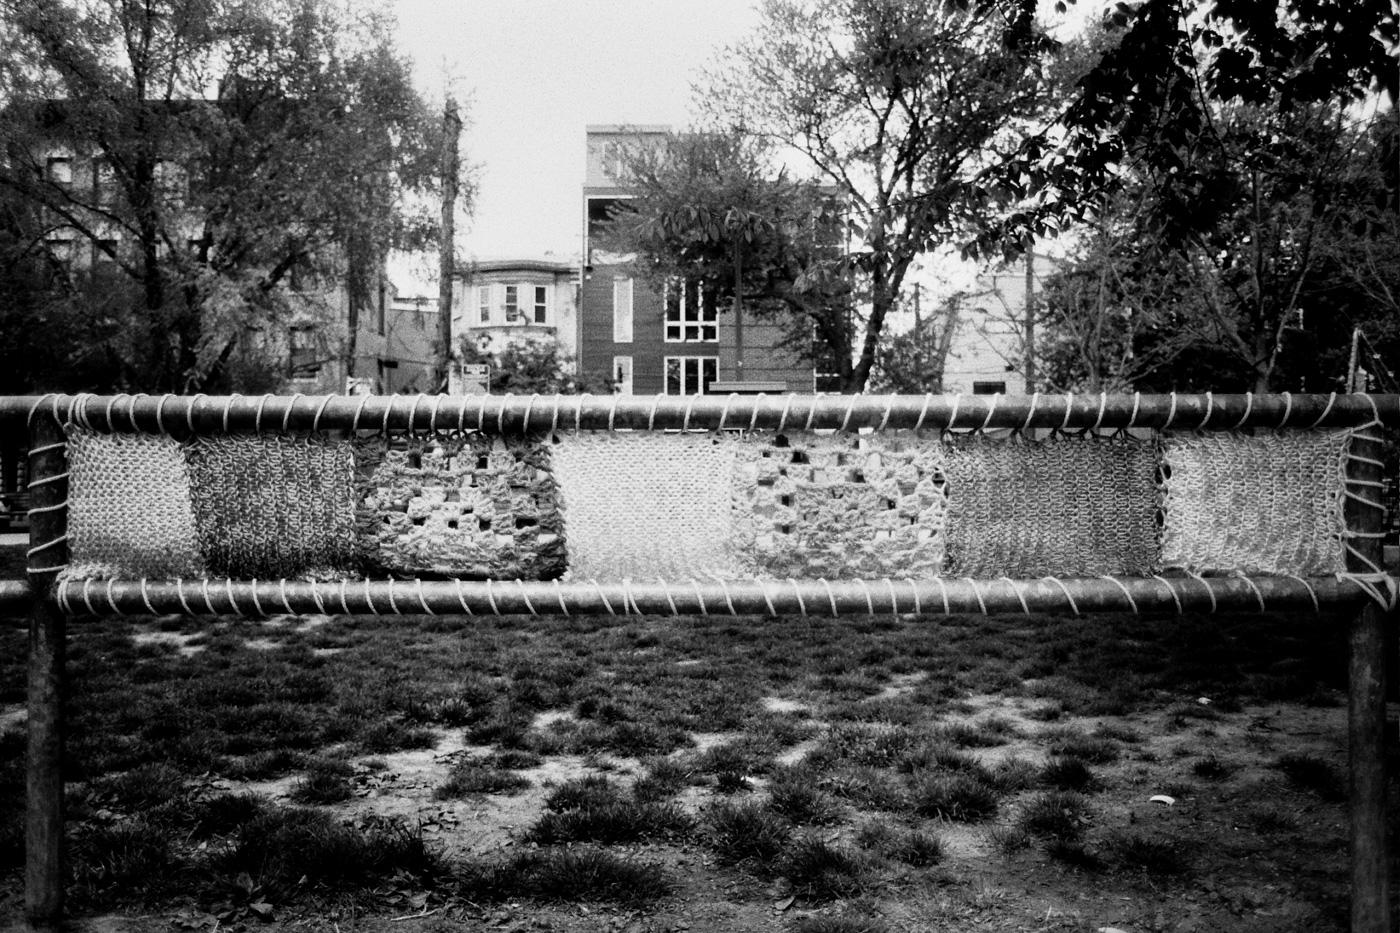 Yarned Fence